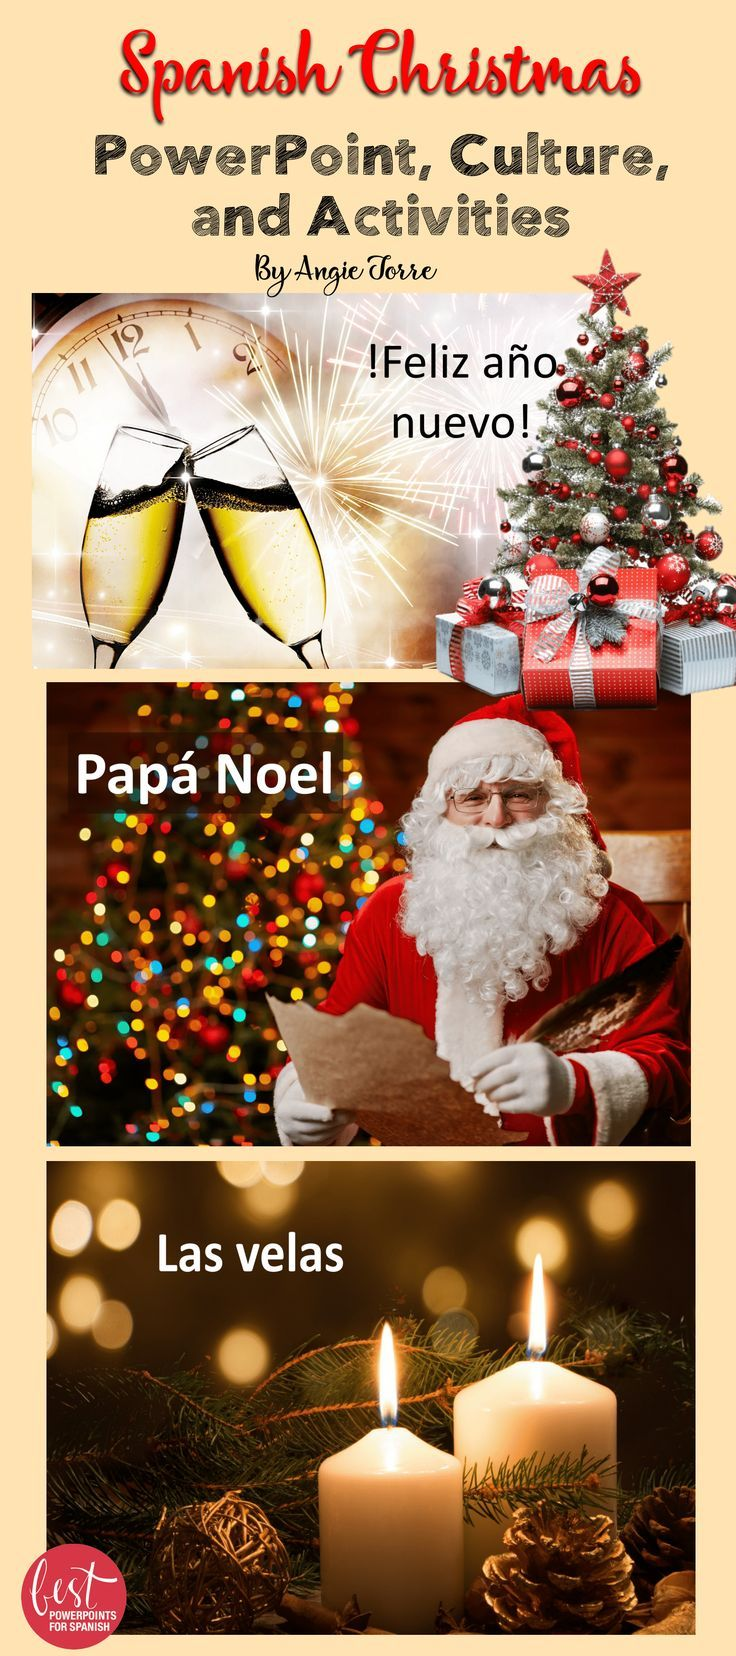 Spanish Christmas La Navidad Powerpoint Culture And Activities Bundle Spanish Christmas Spanish Holidays Spanish